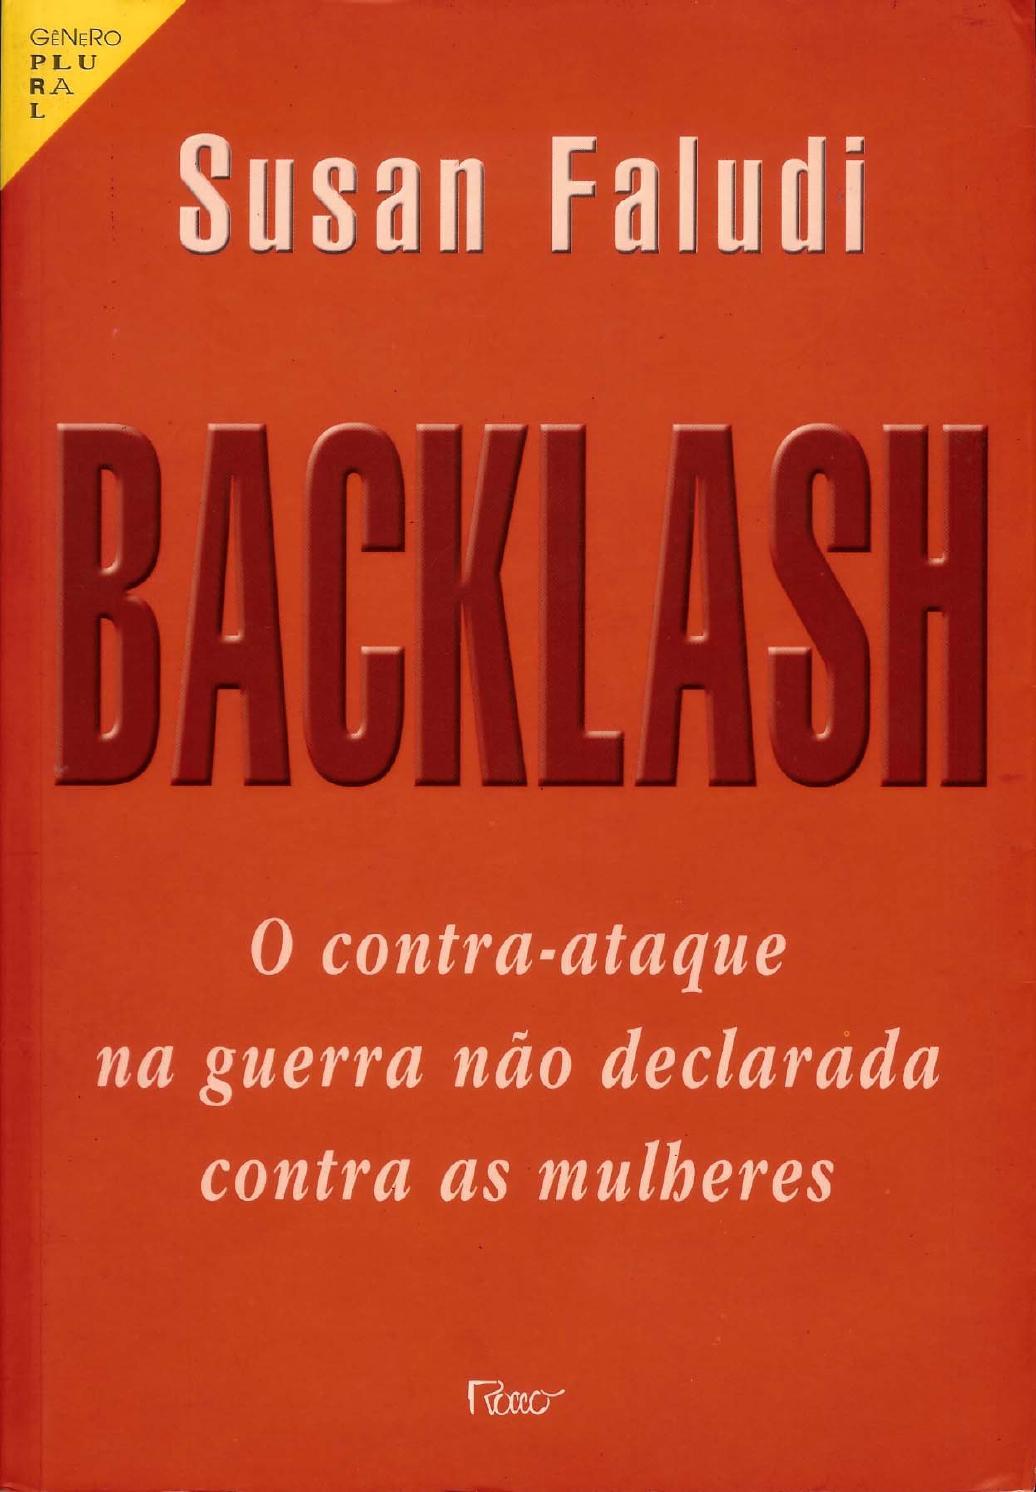 Livro backlash by Jannayna Lima - issuu ebe1aa2d63